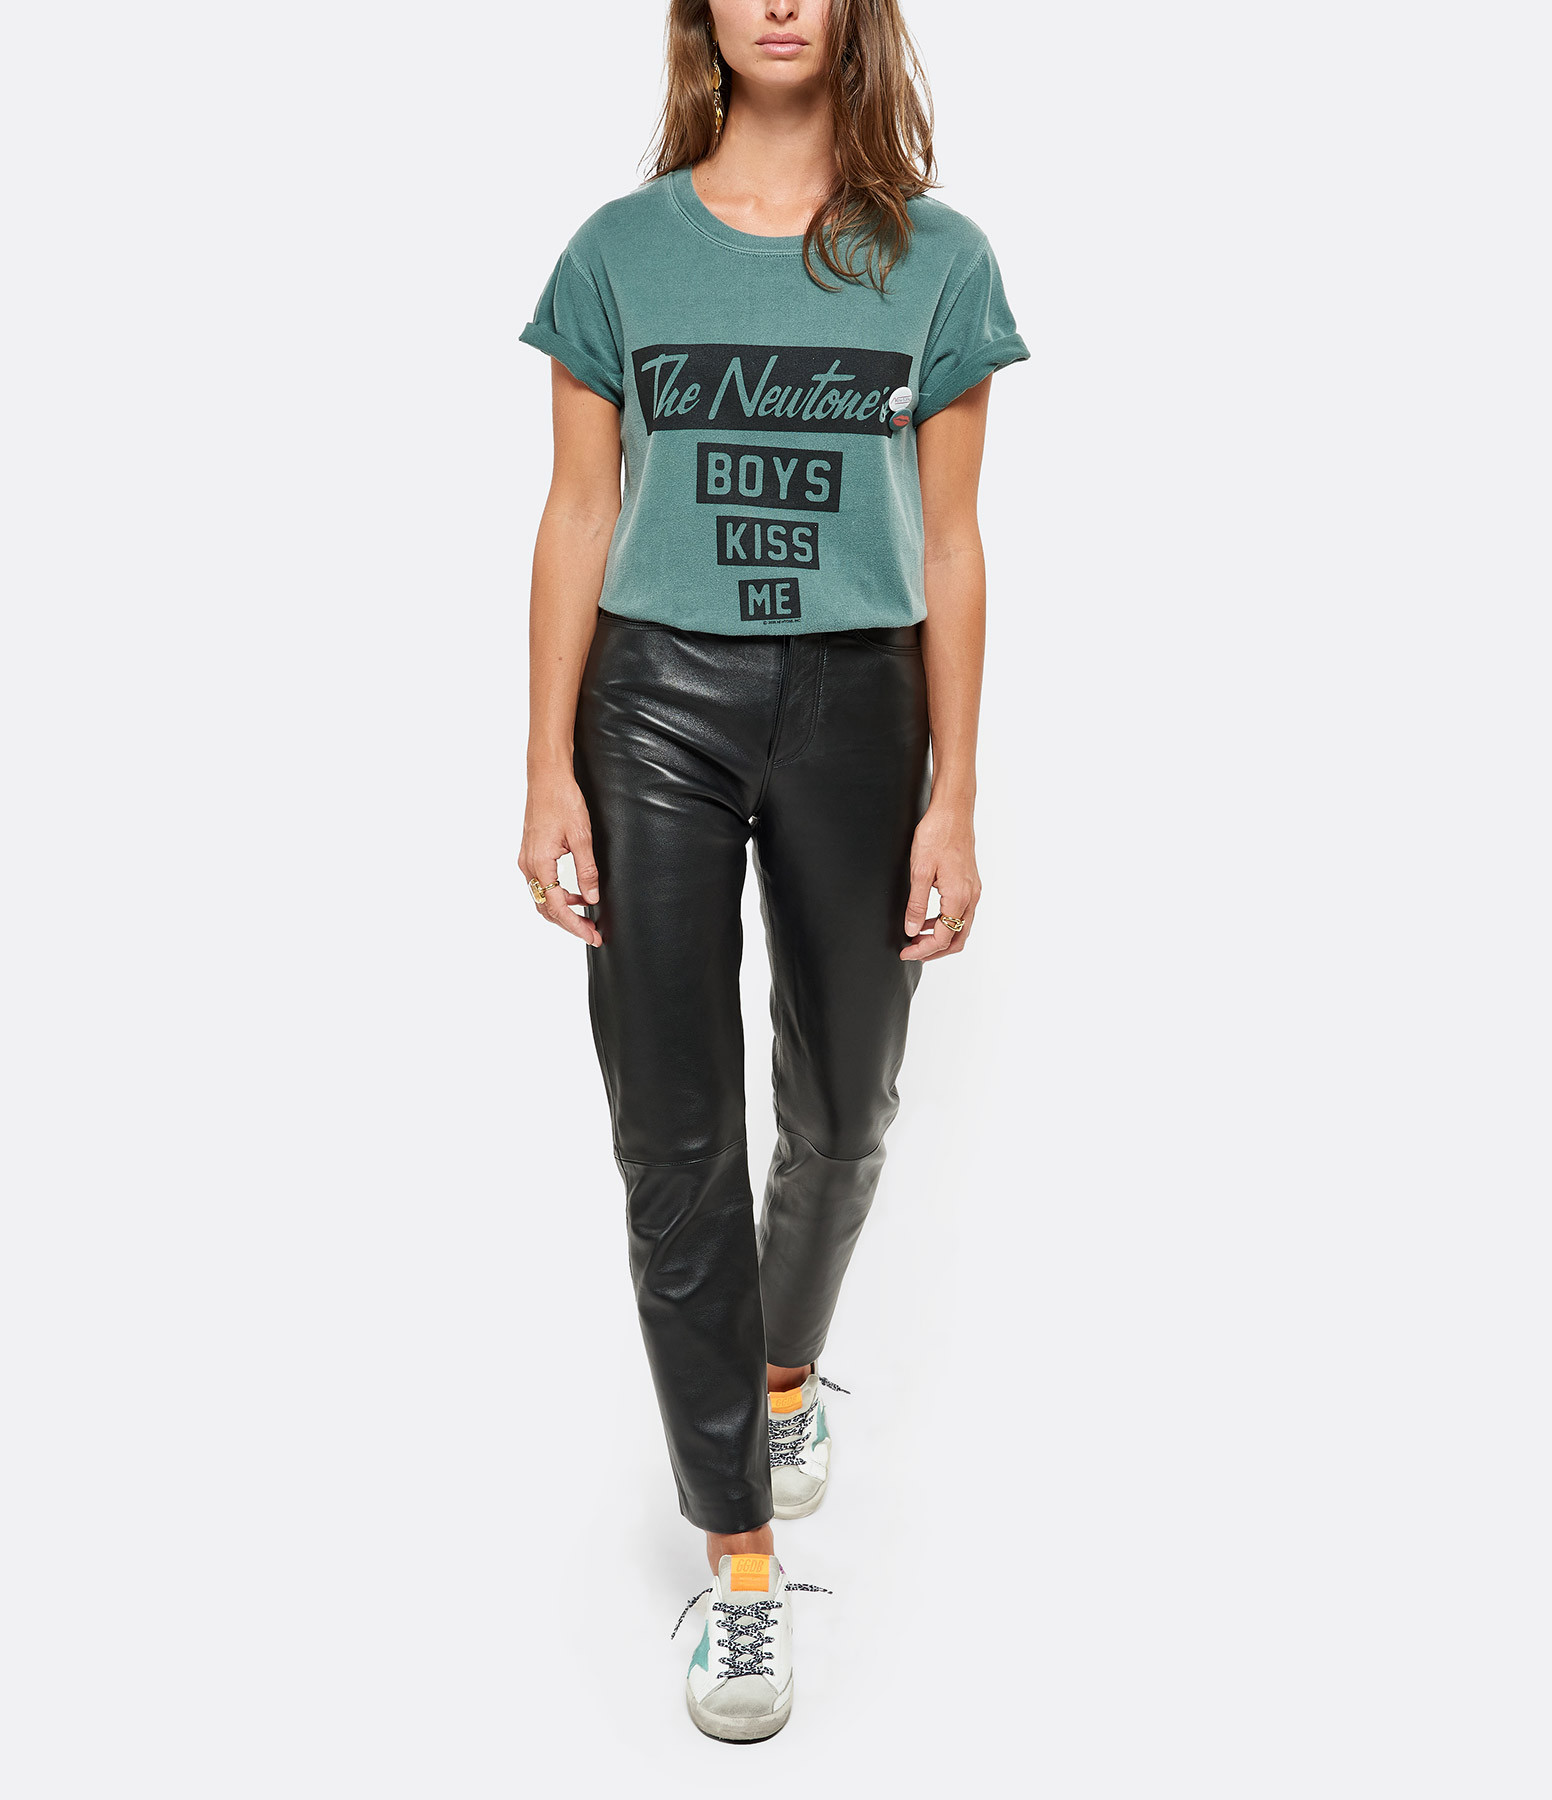 NEWTONE - Tee-shirt Kiss Me Coton Forêt